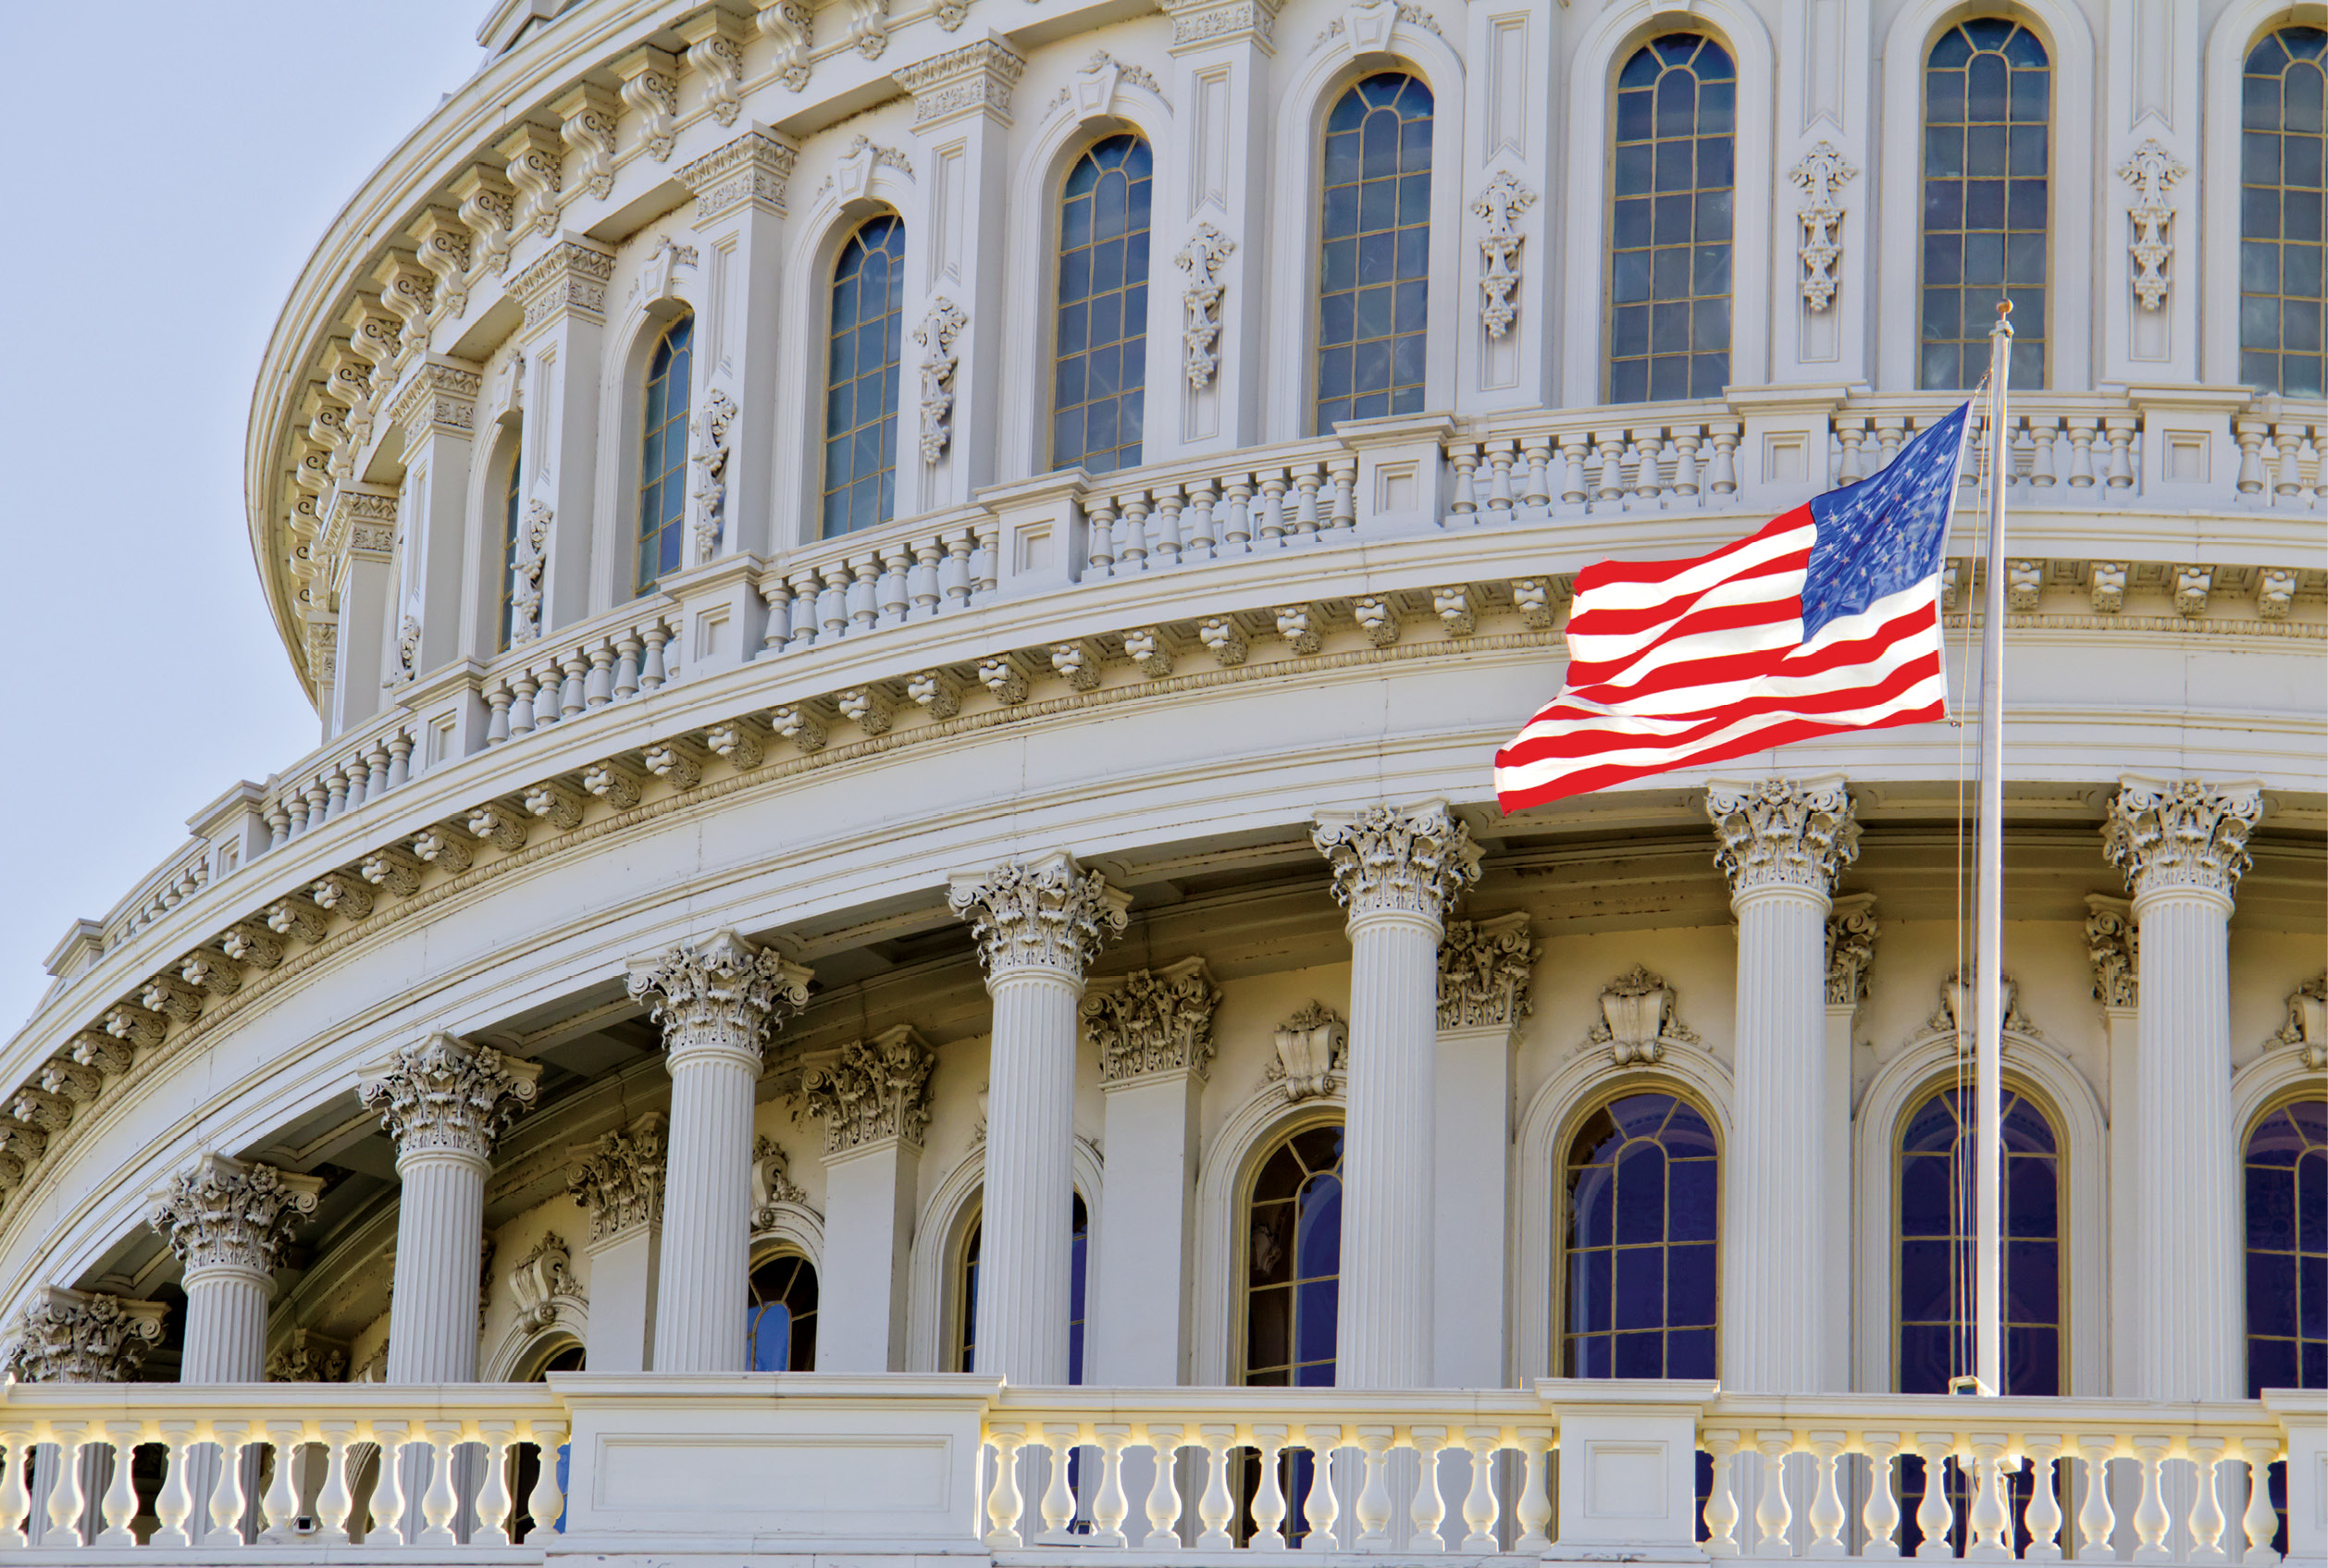 Washington DC: US Capitol Building